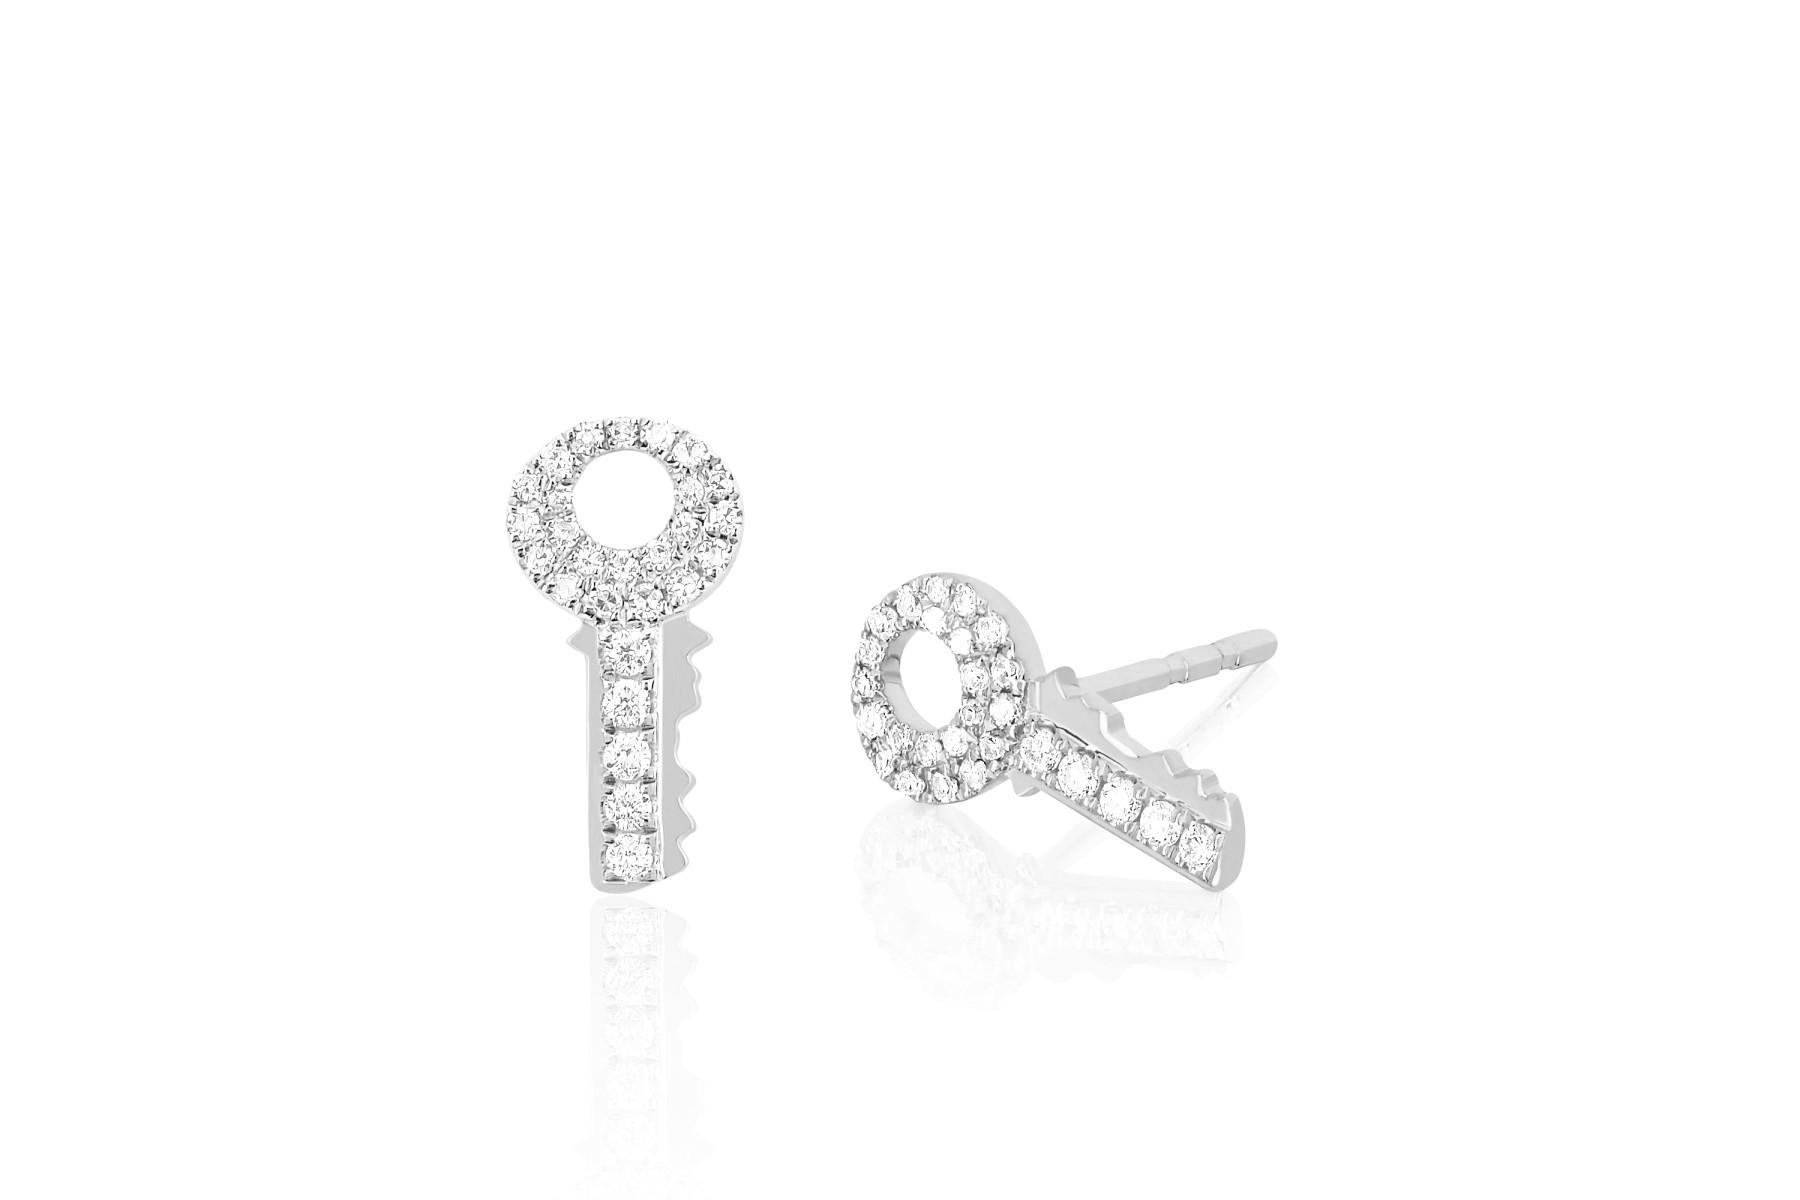 EF Collection Diamond Key Stud Earrings in 14K White Gold